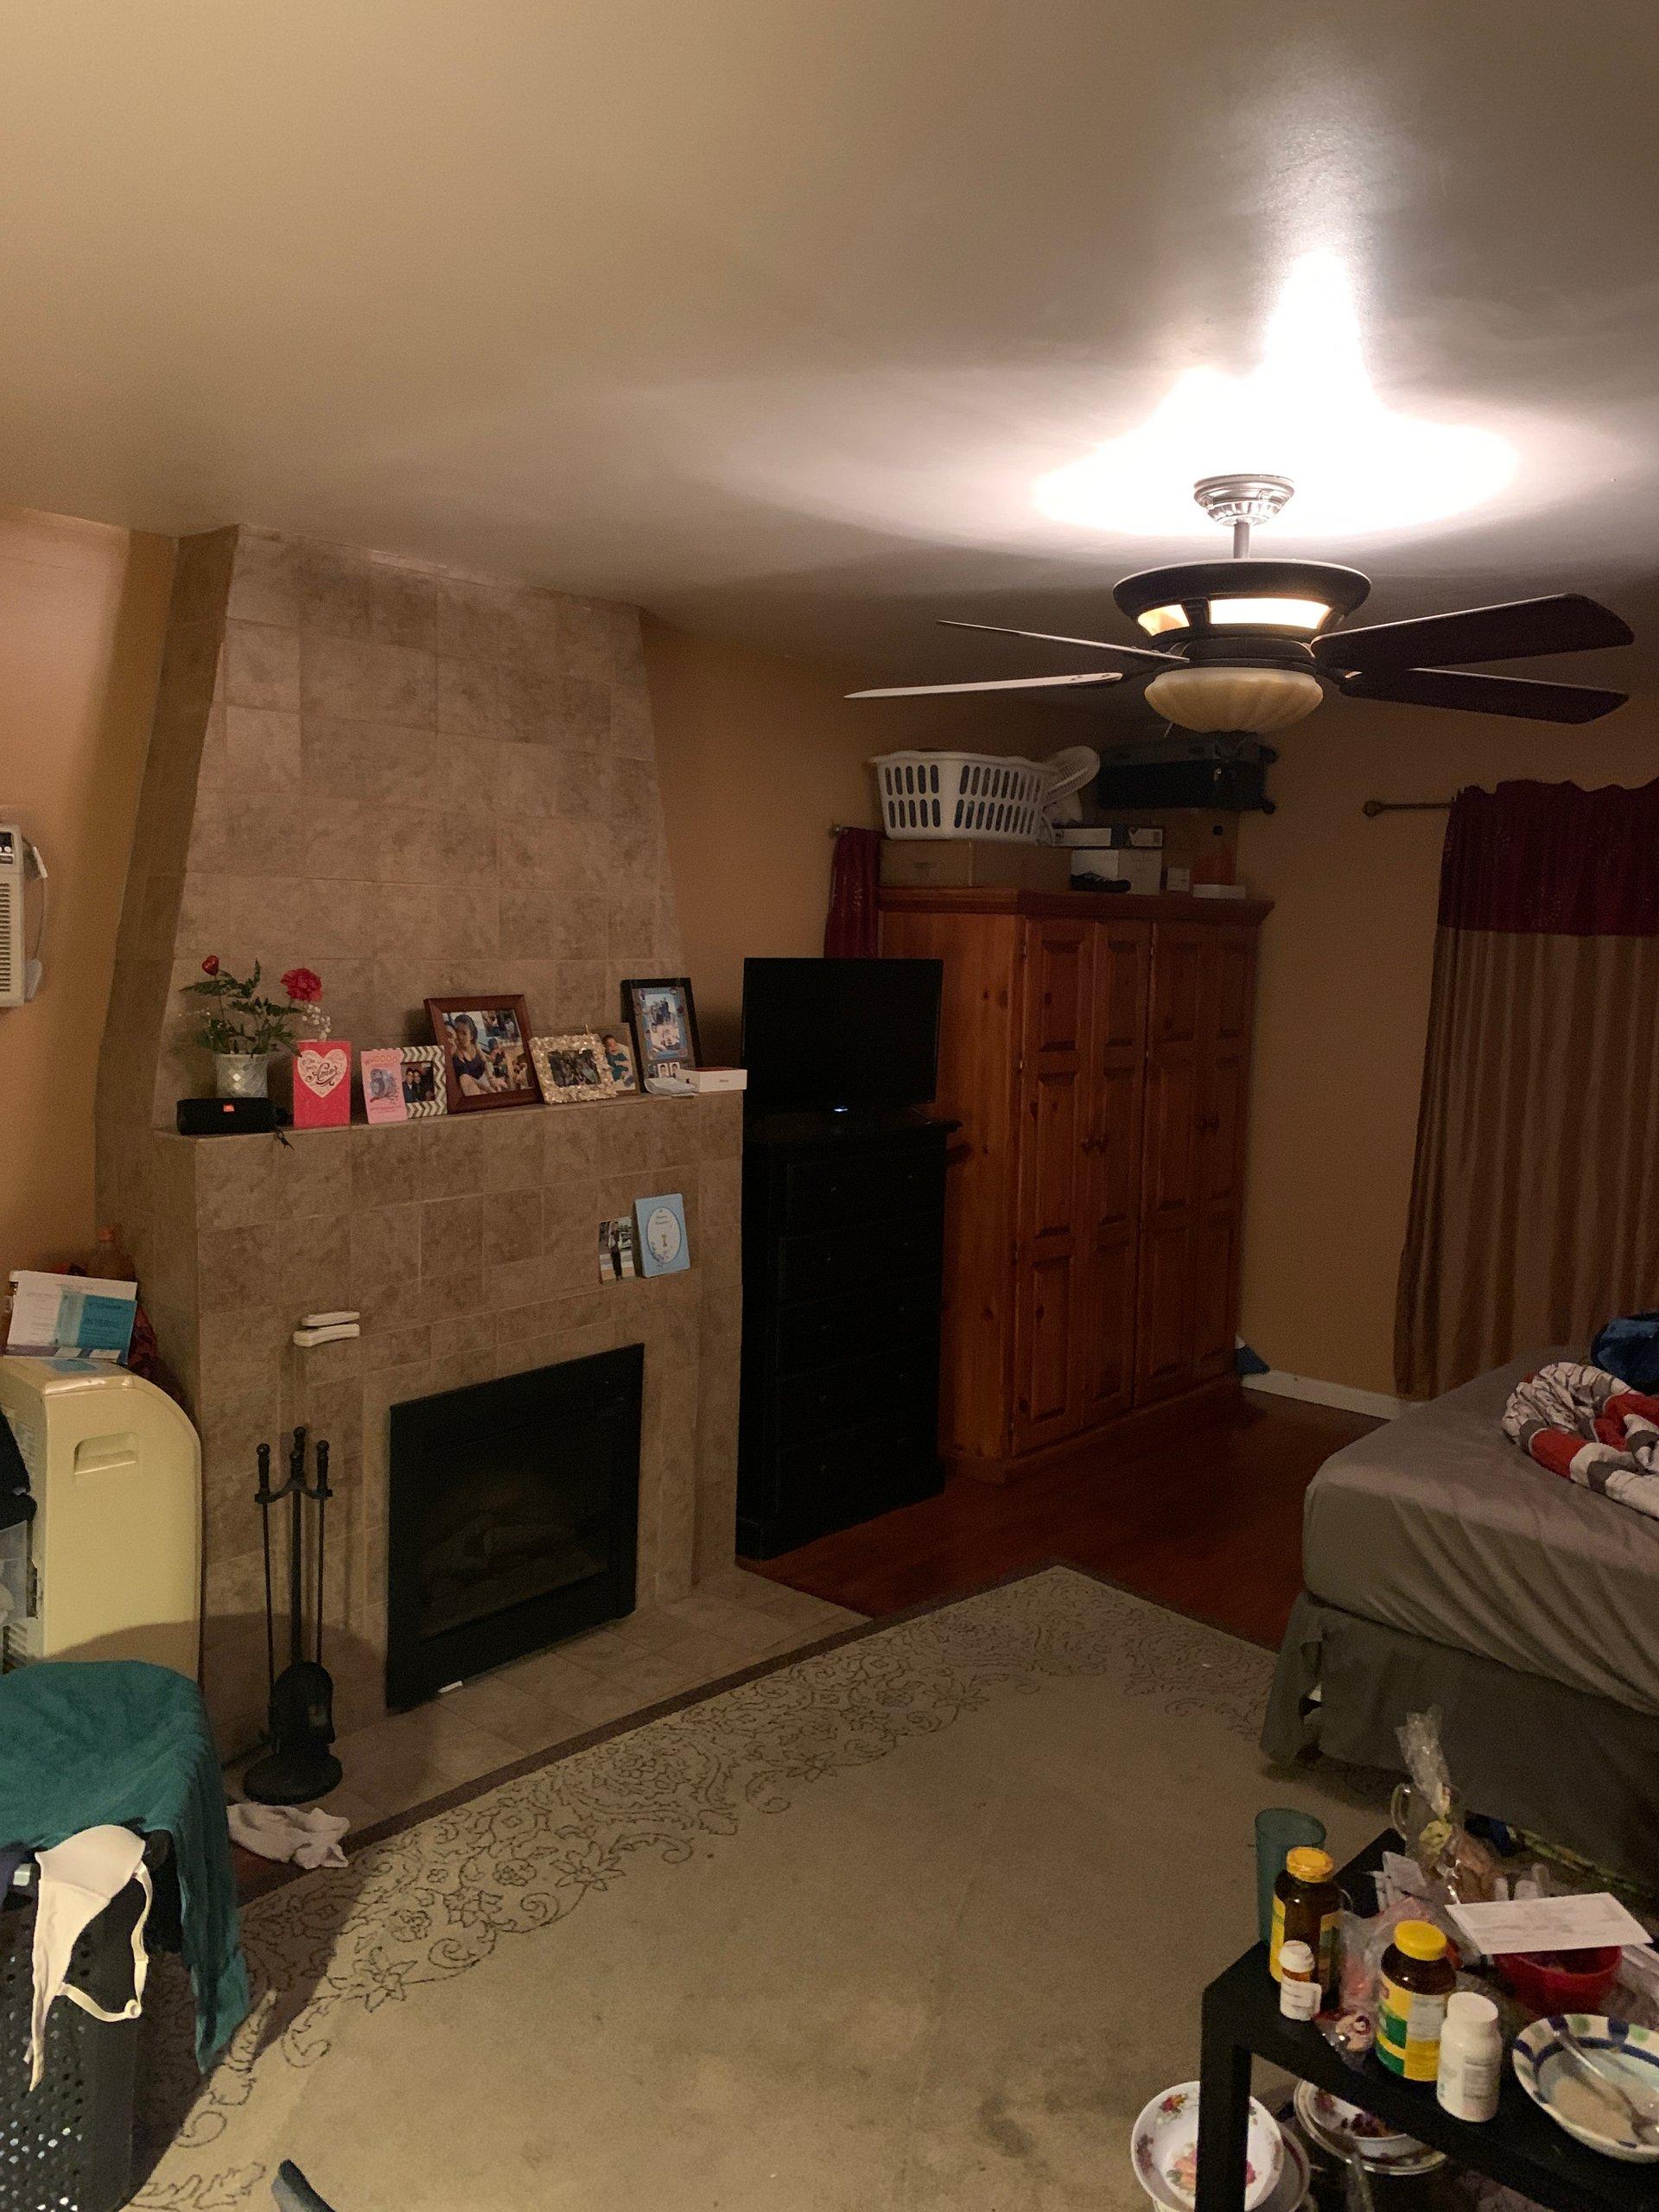 3x5 Bedroom self storage unit